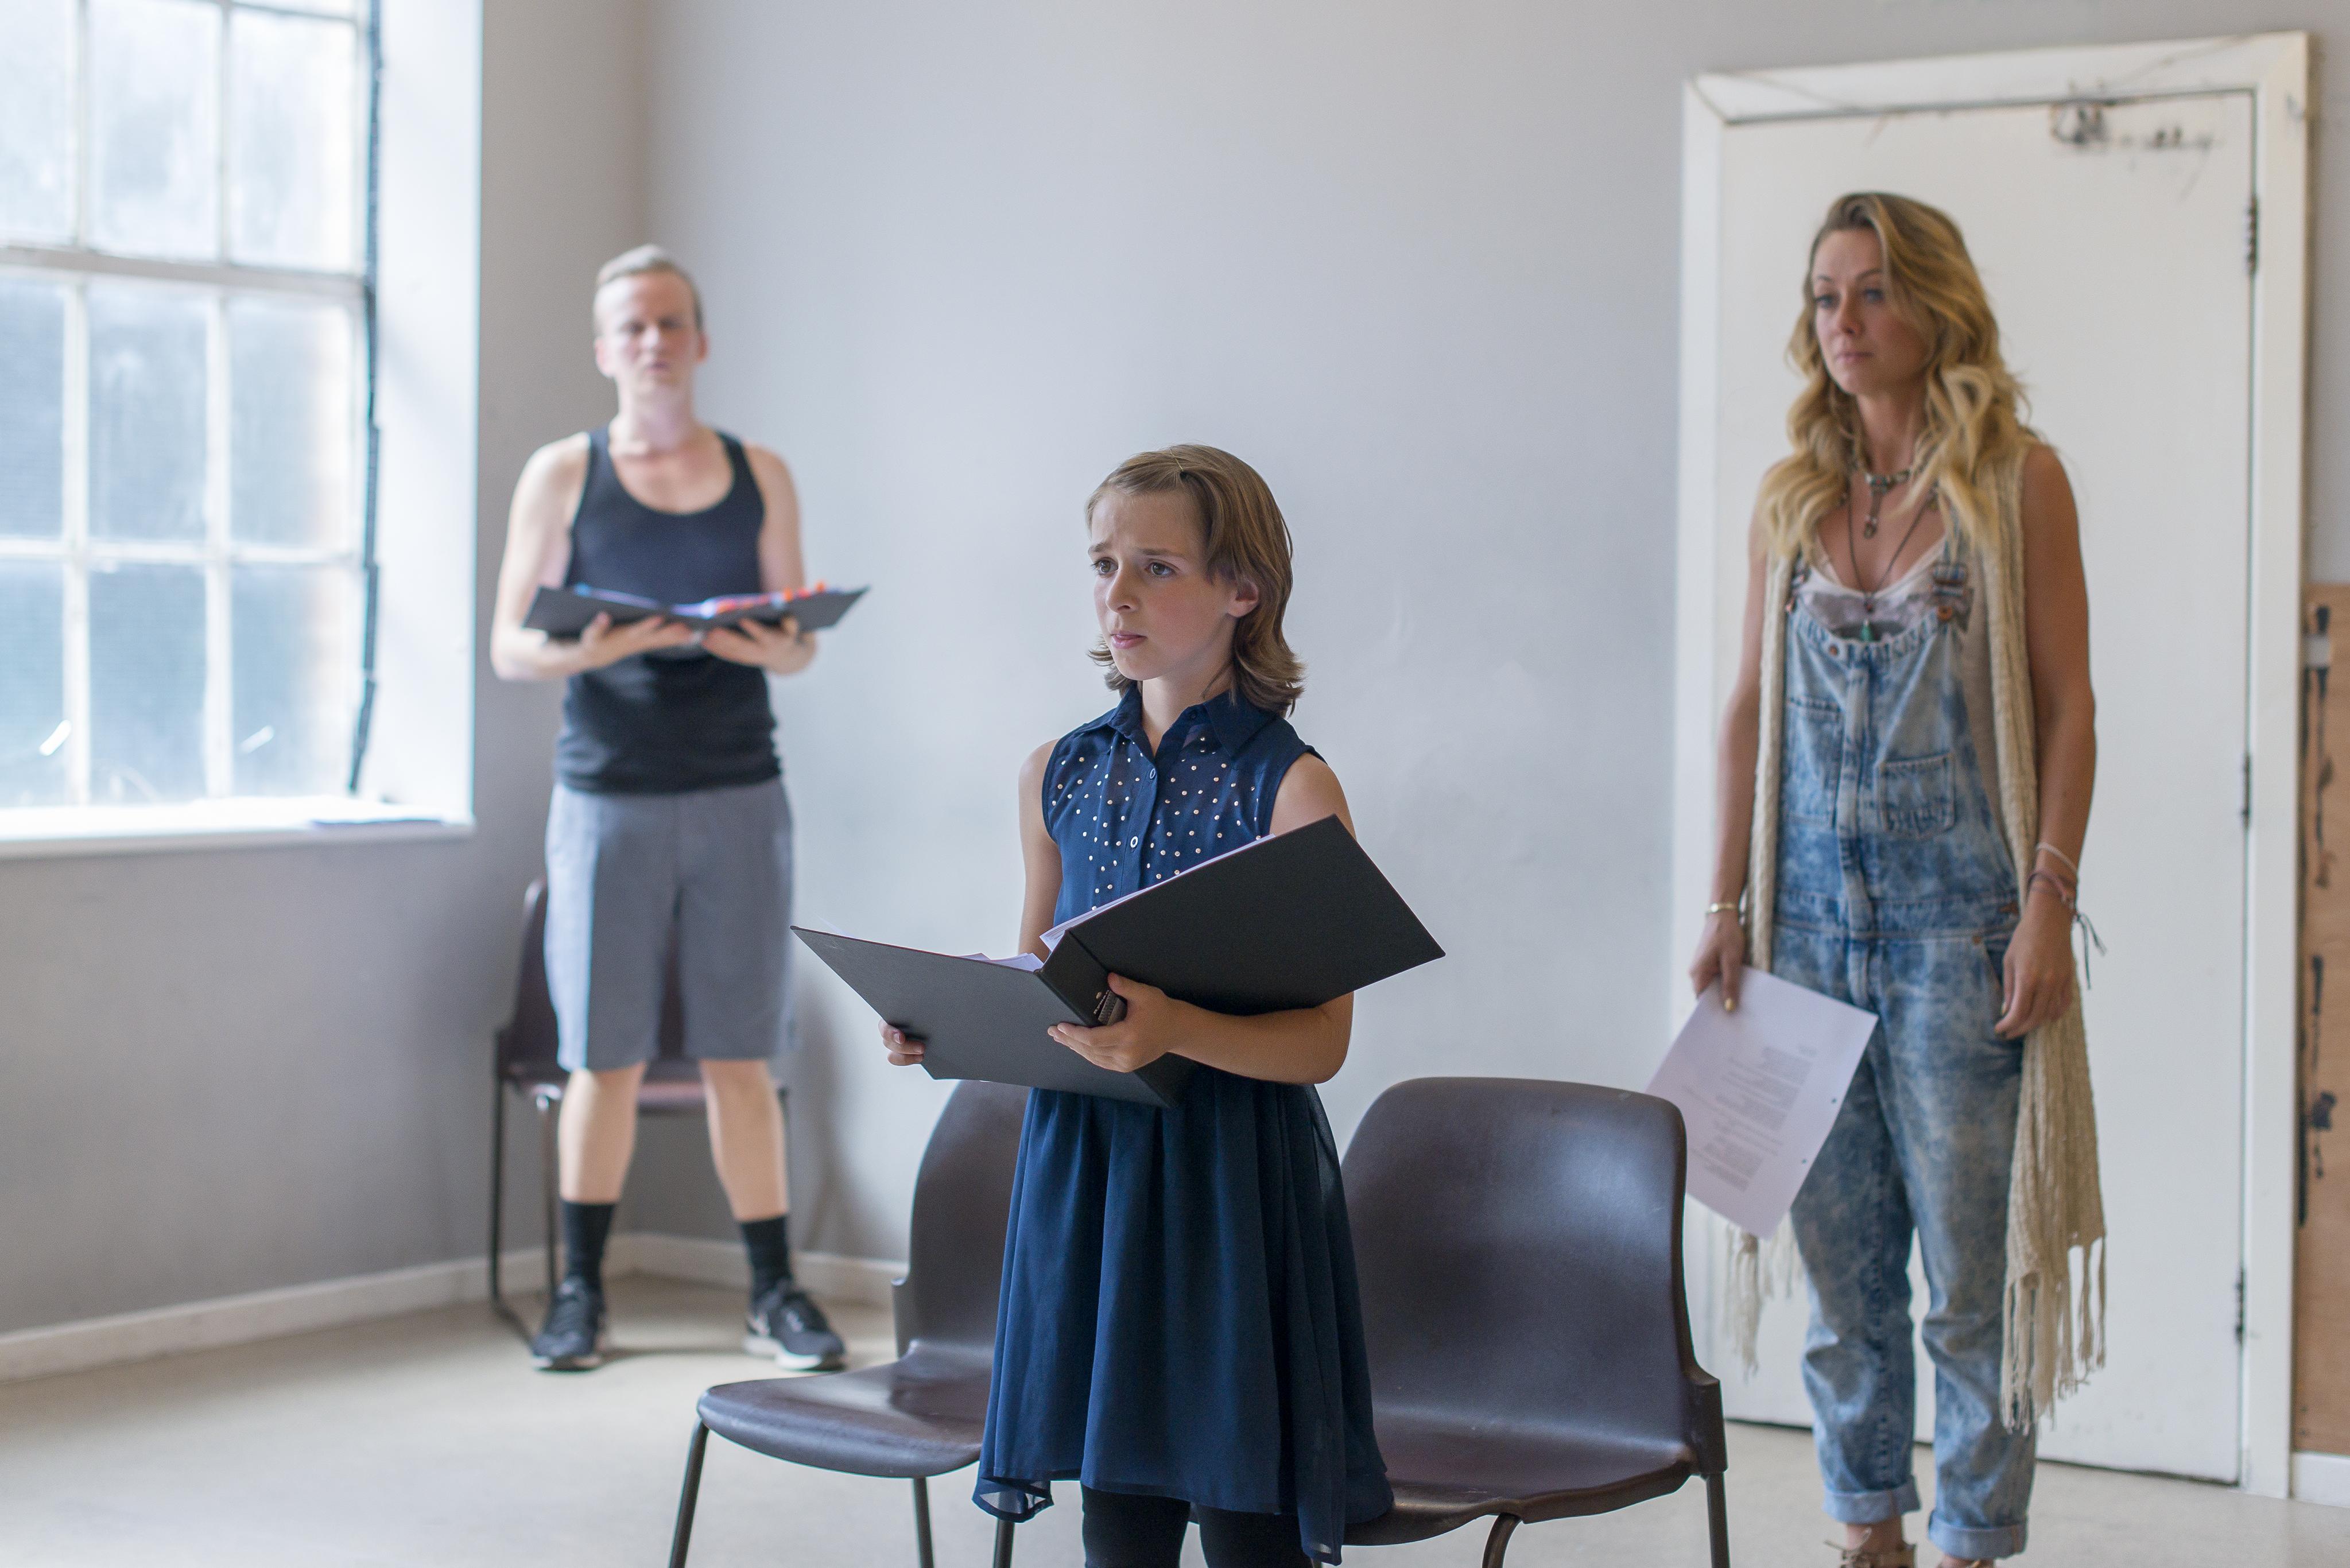 theatre, rehearsal, photographer